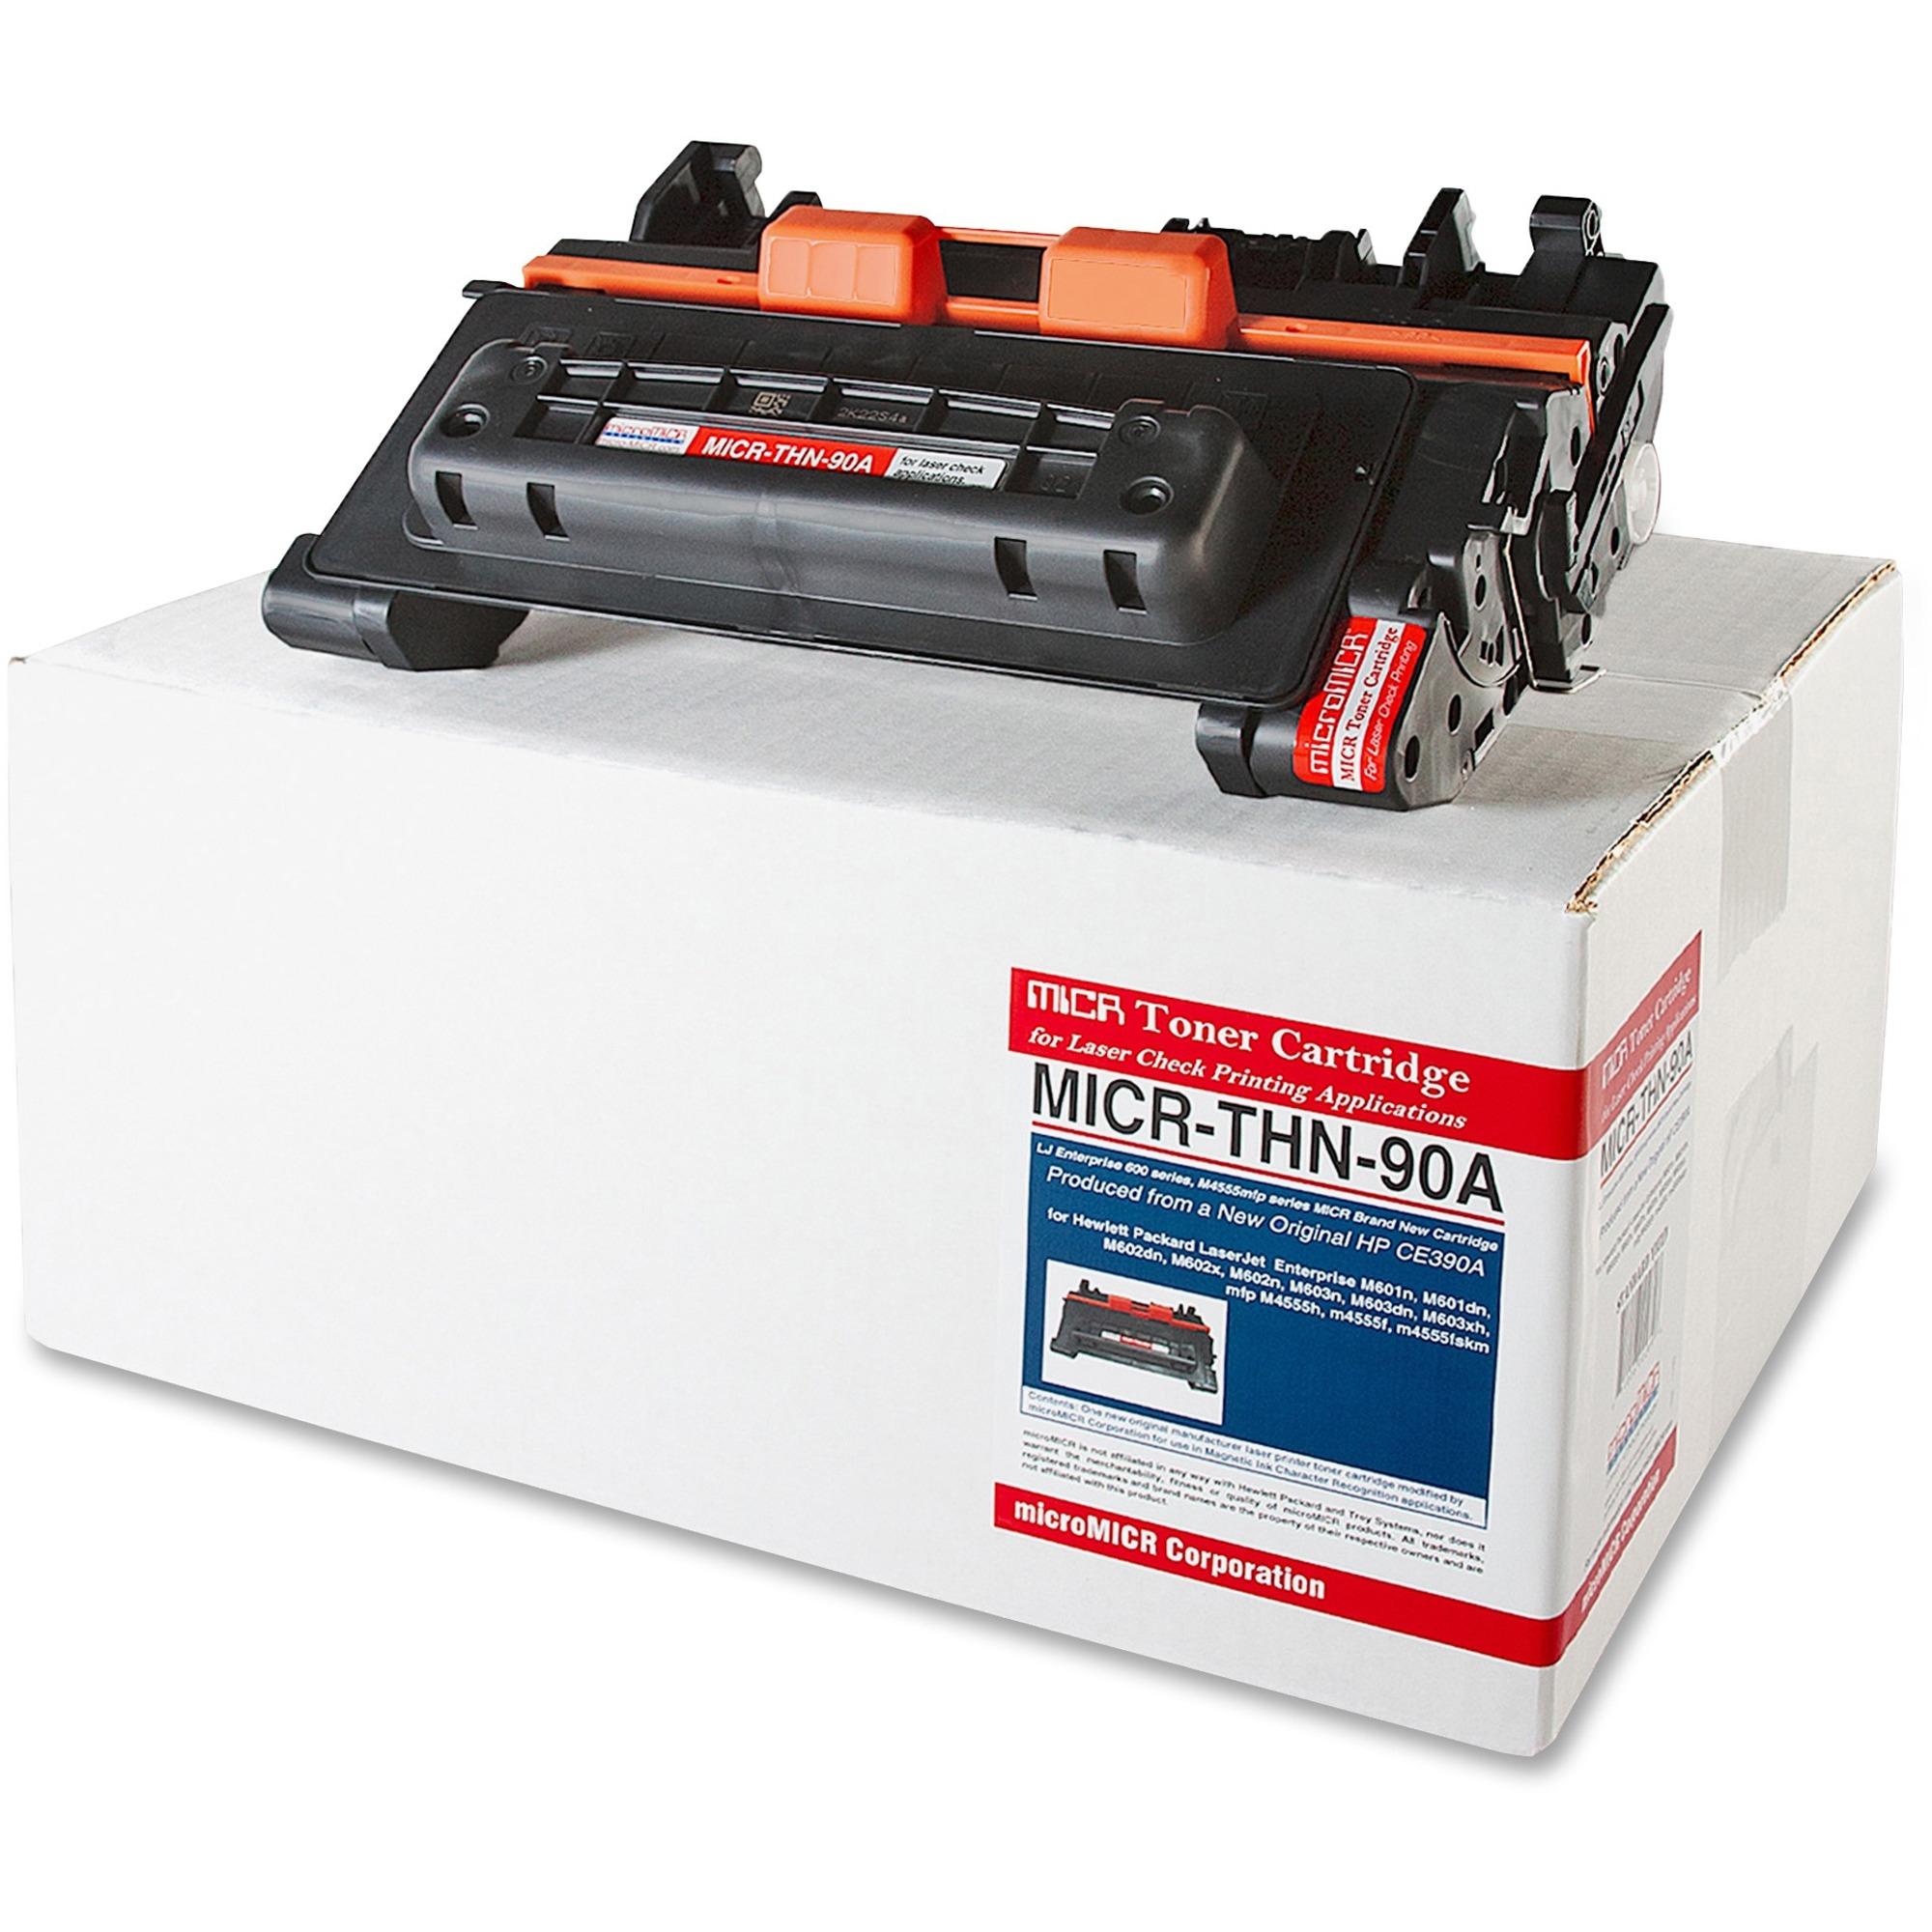 6 pk CE390A Toner Cartridge for HP 600 M601n 600 M602n 600 M601dn Printer